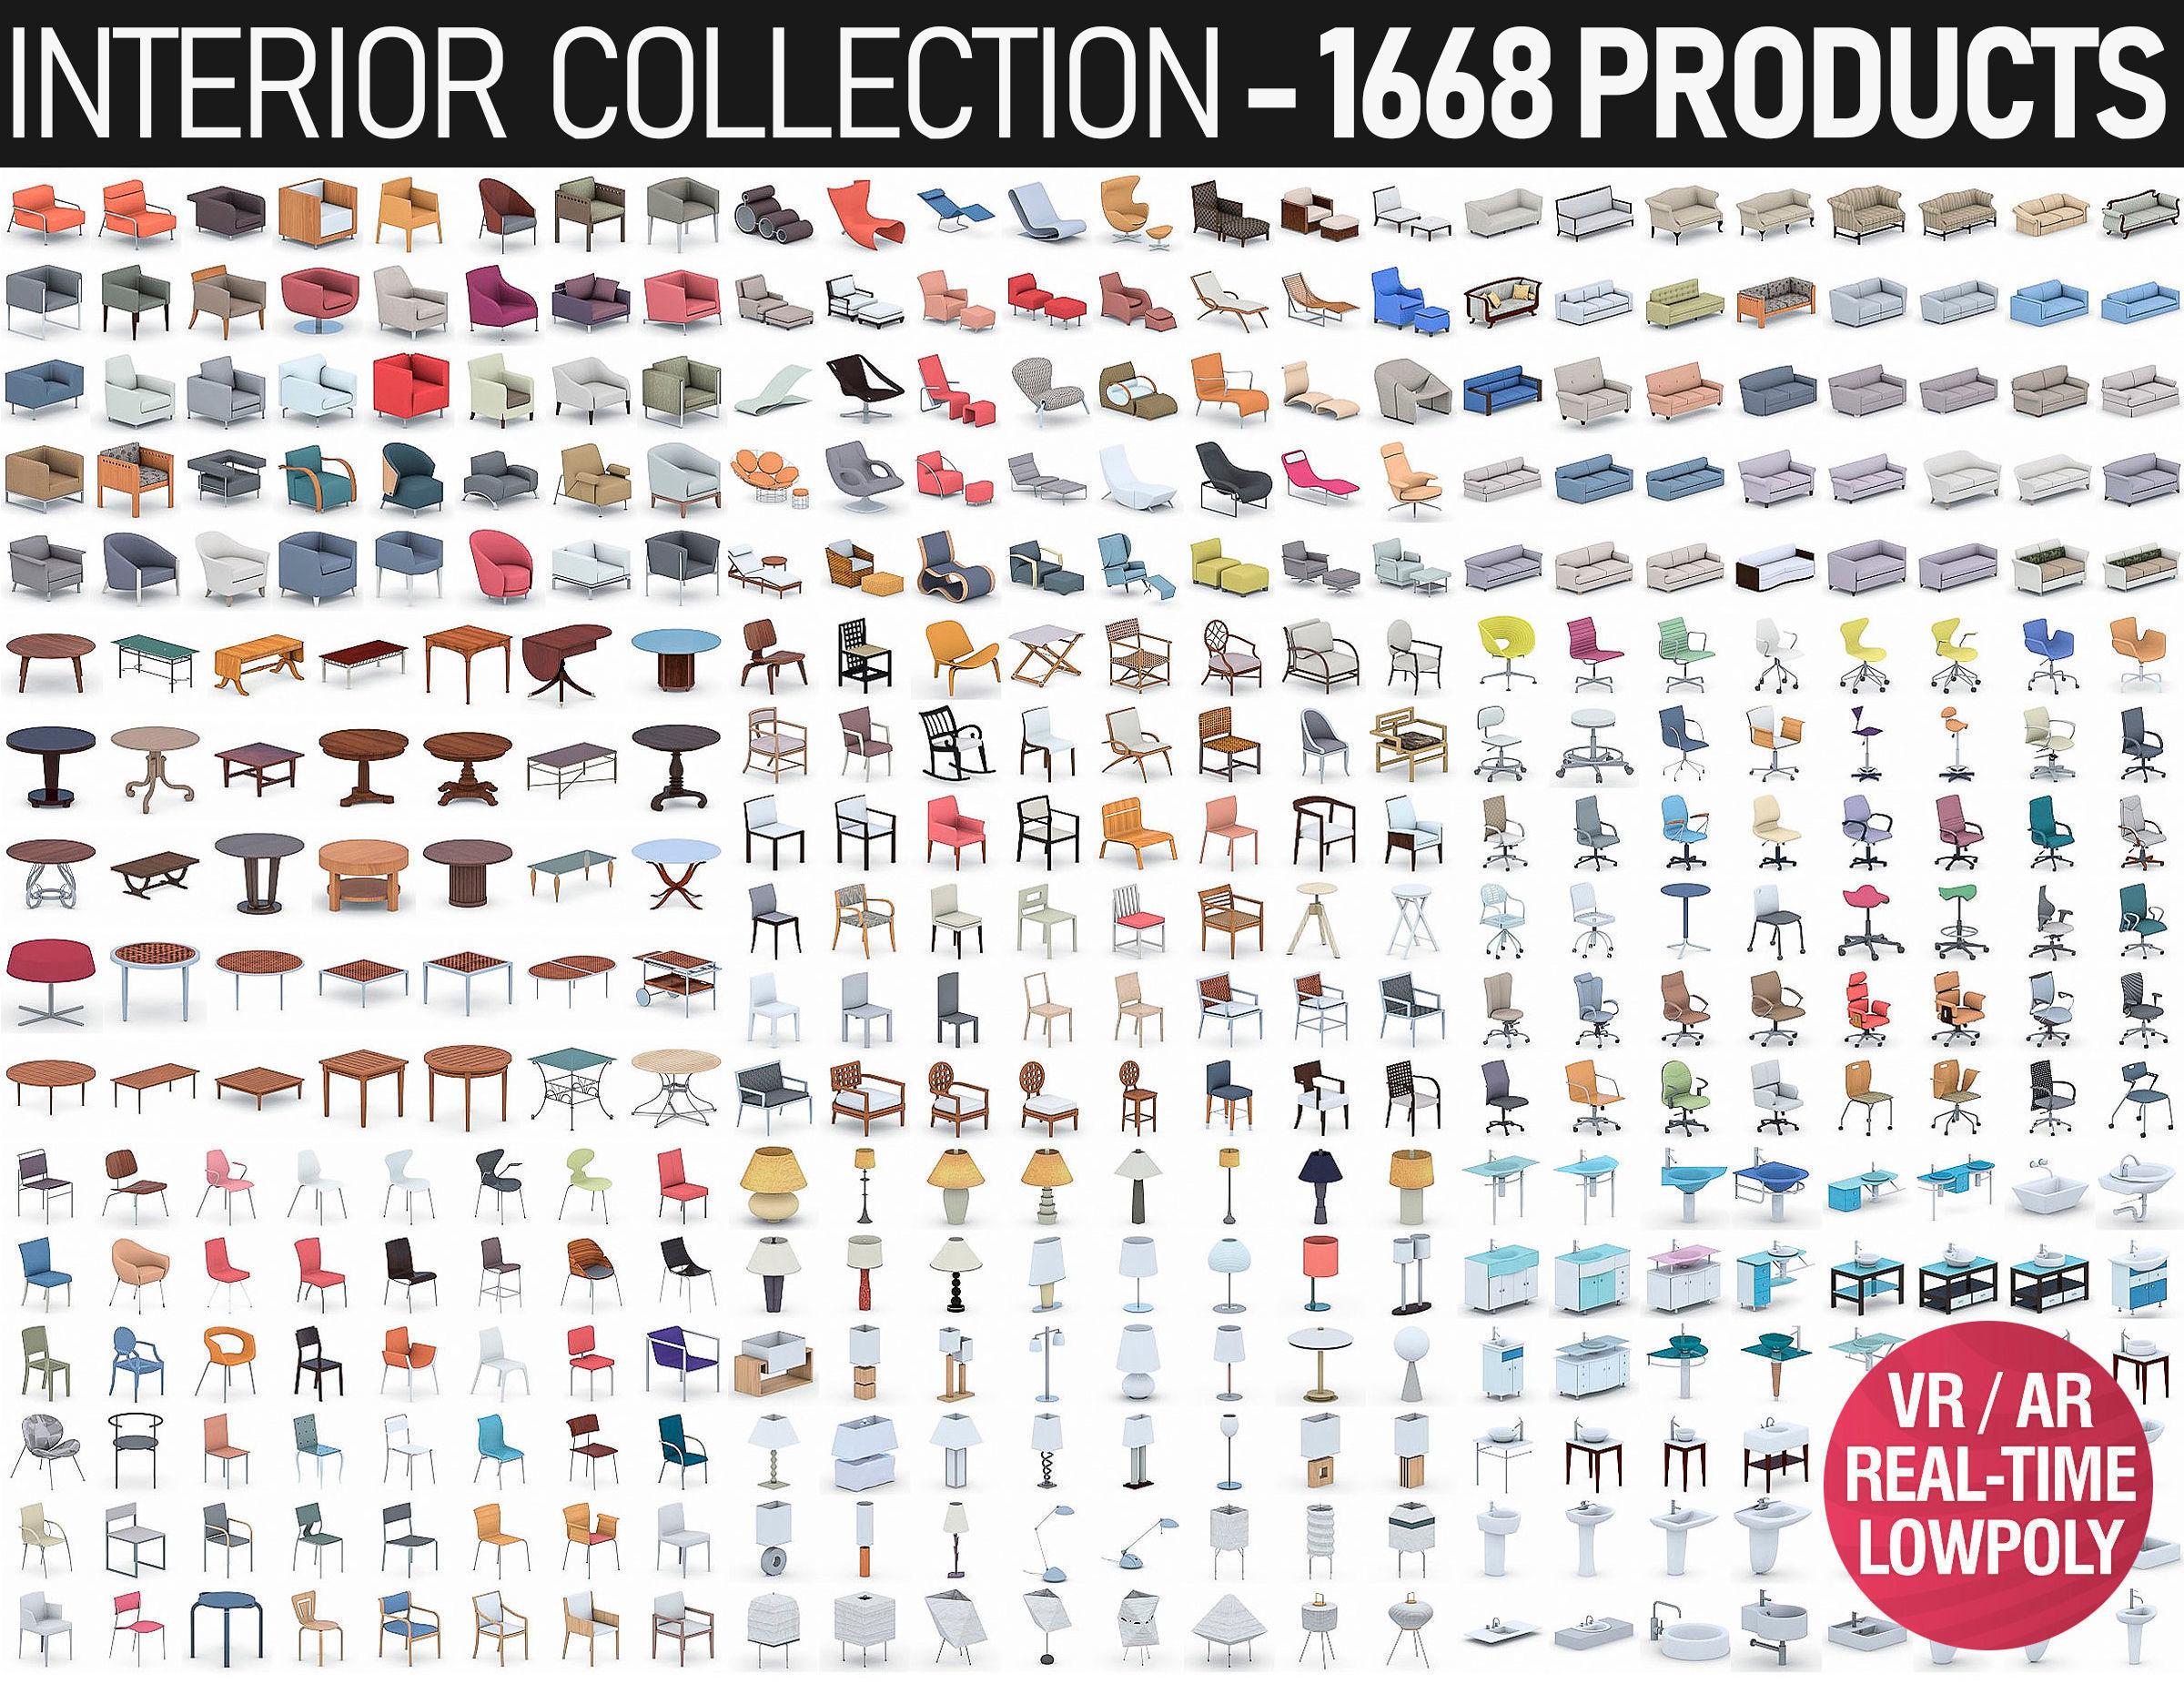 Interior Furniture Collection - 1668 MEGAPACK